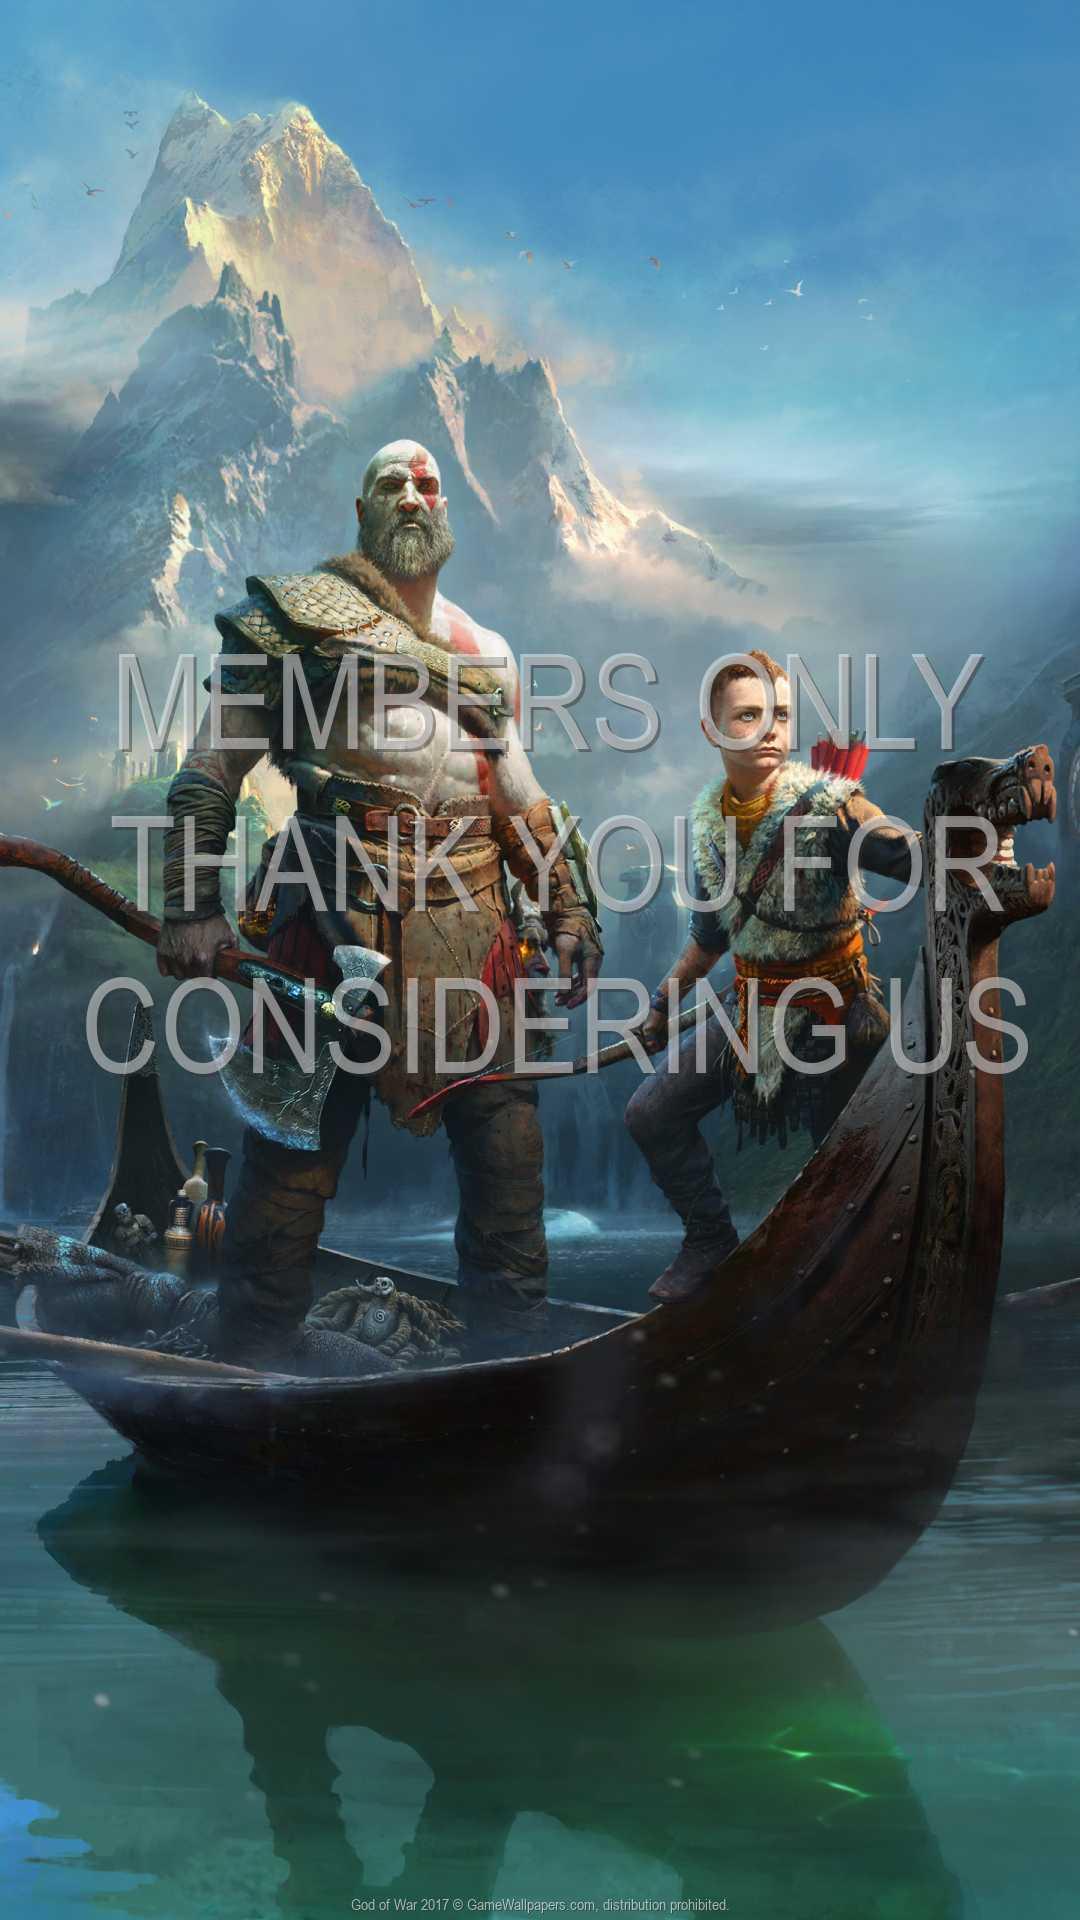 God of War 2017 1080p Vertical Móvil fondo de escritorio 03